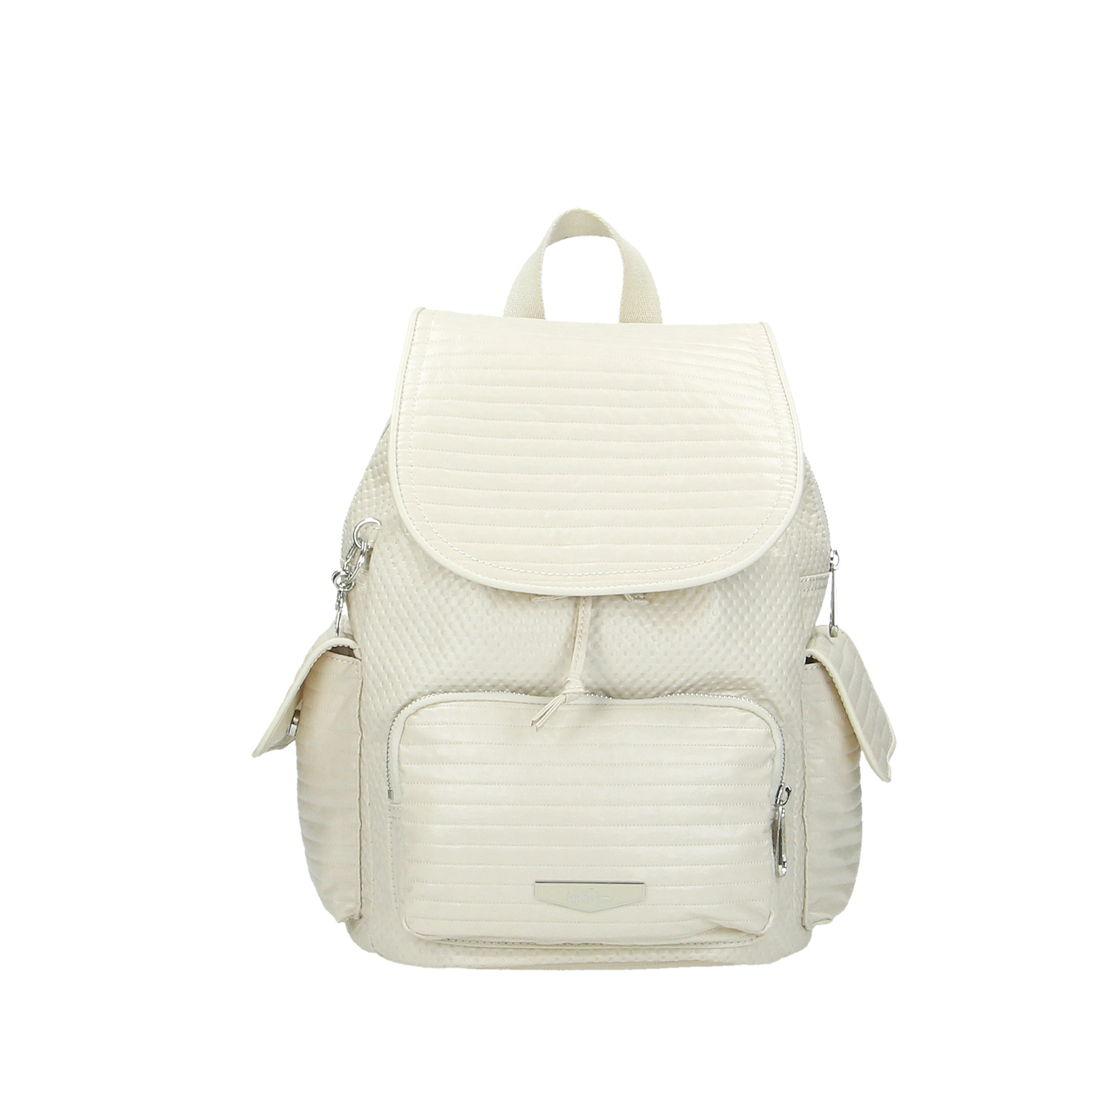 City Pack S Shiny White